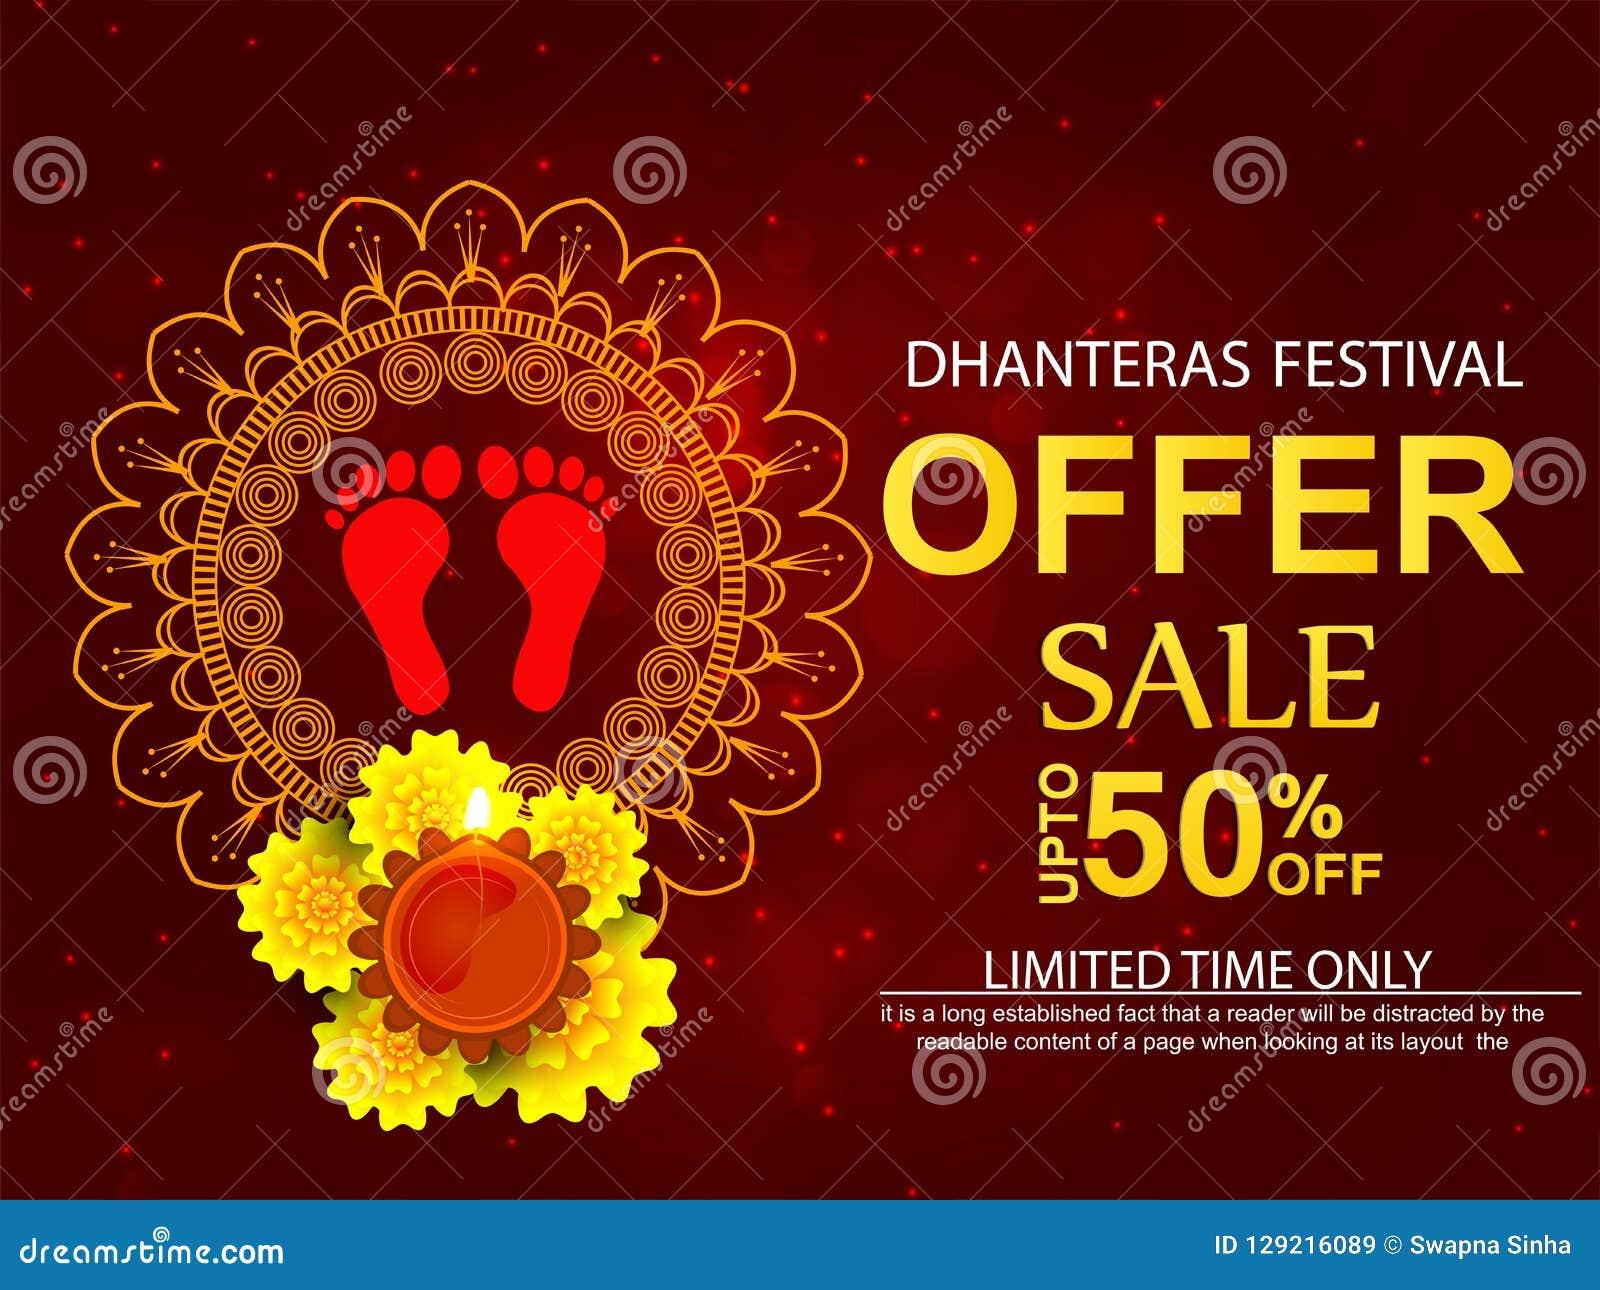 Creative Abstract Banner Or Poster For Dhanteras Stock Vector